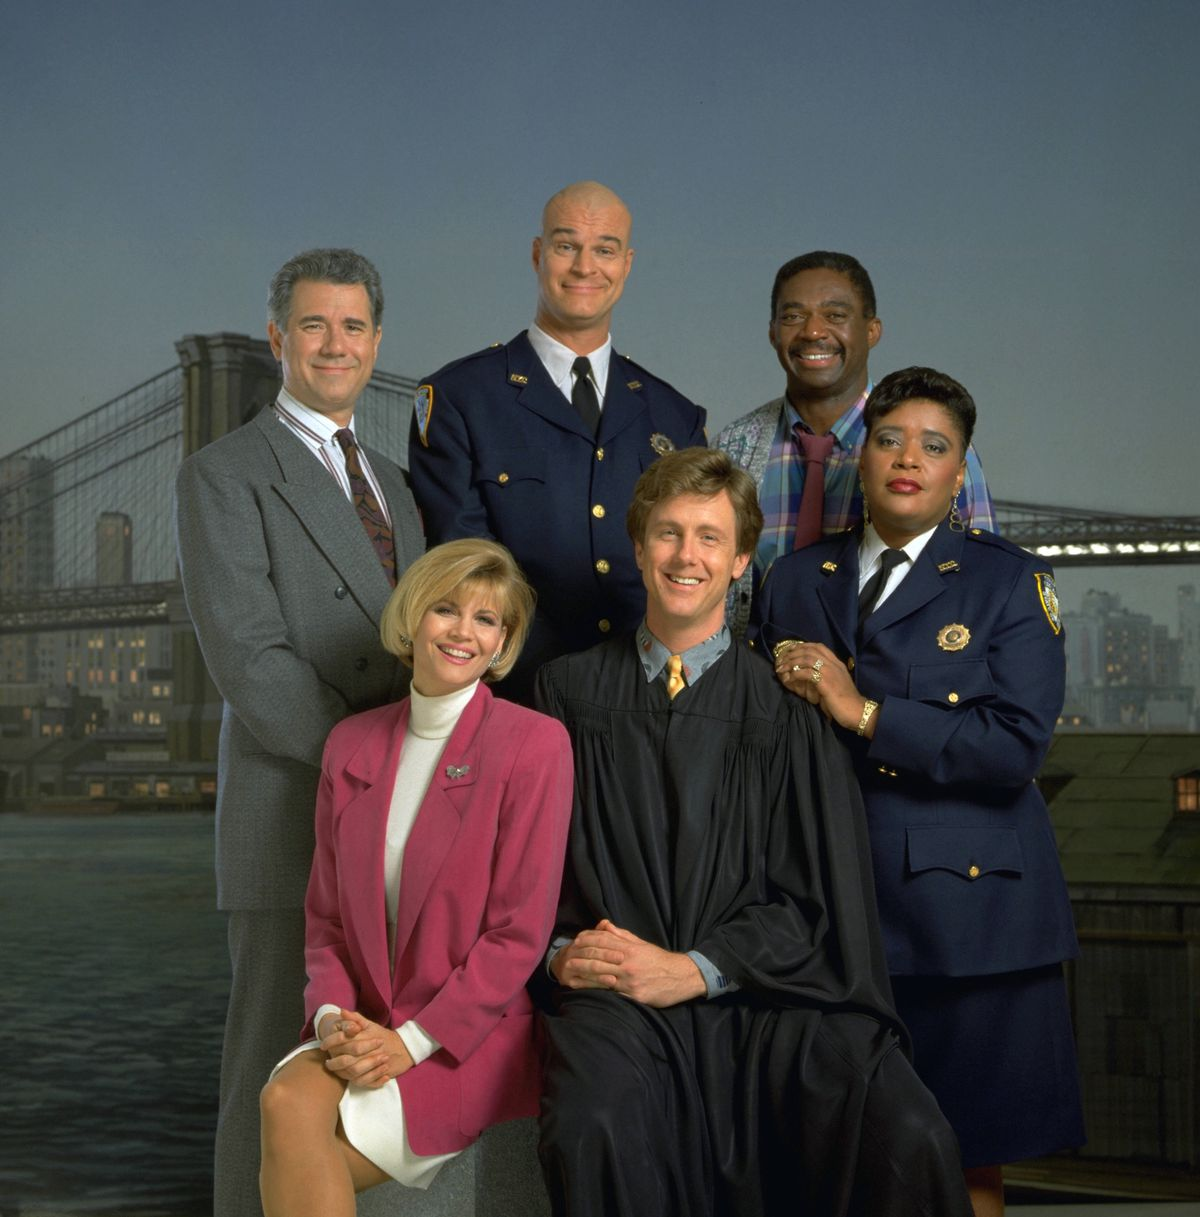 The 'Night Court' cast